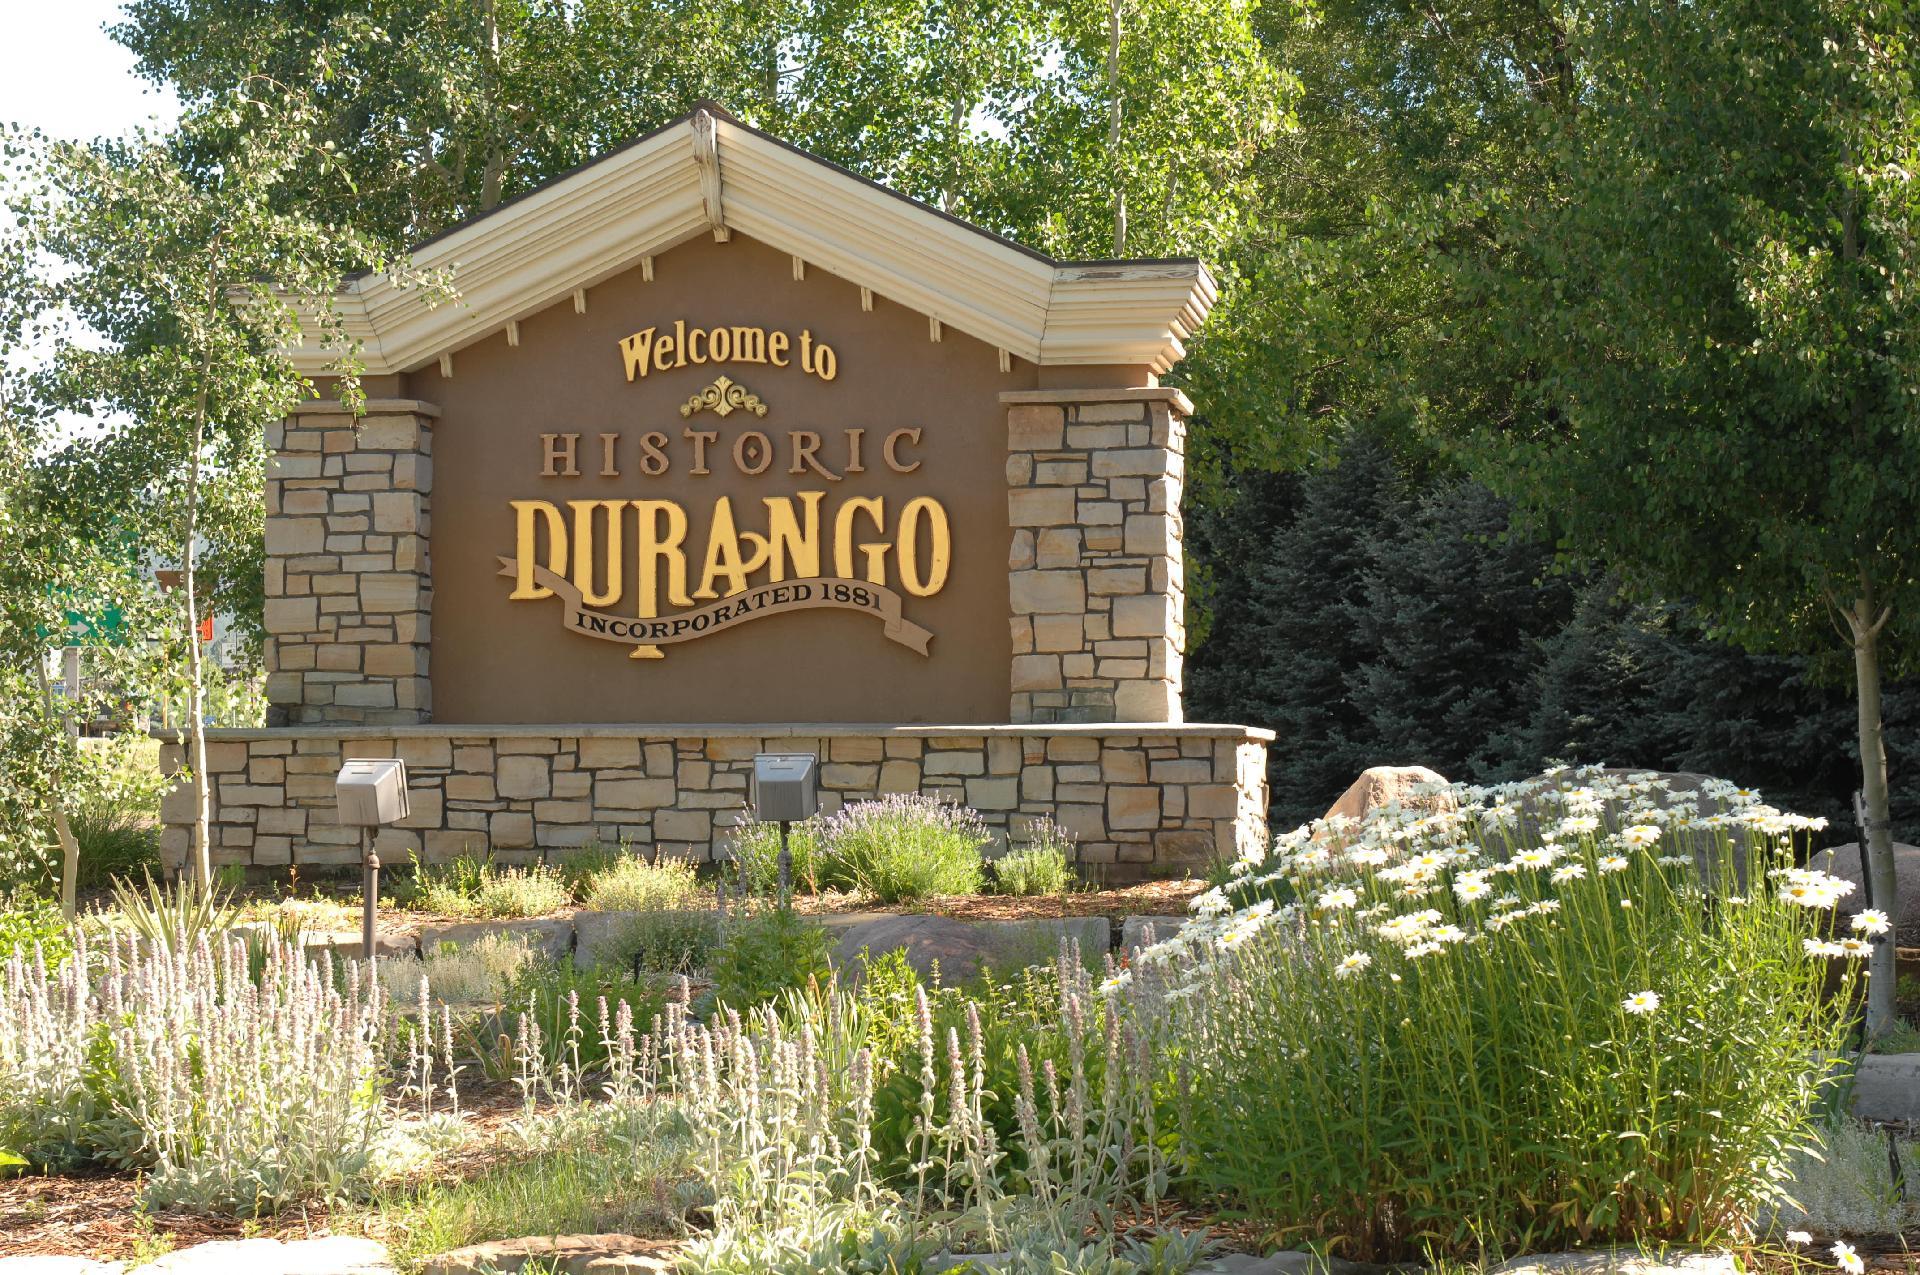 It's a Durango Life Main Photo